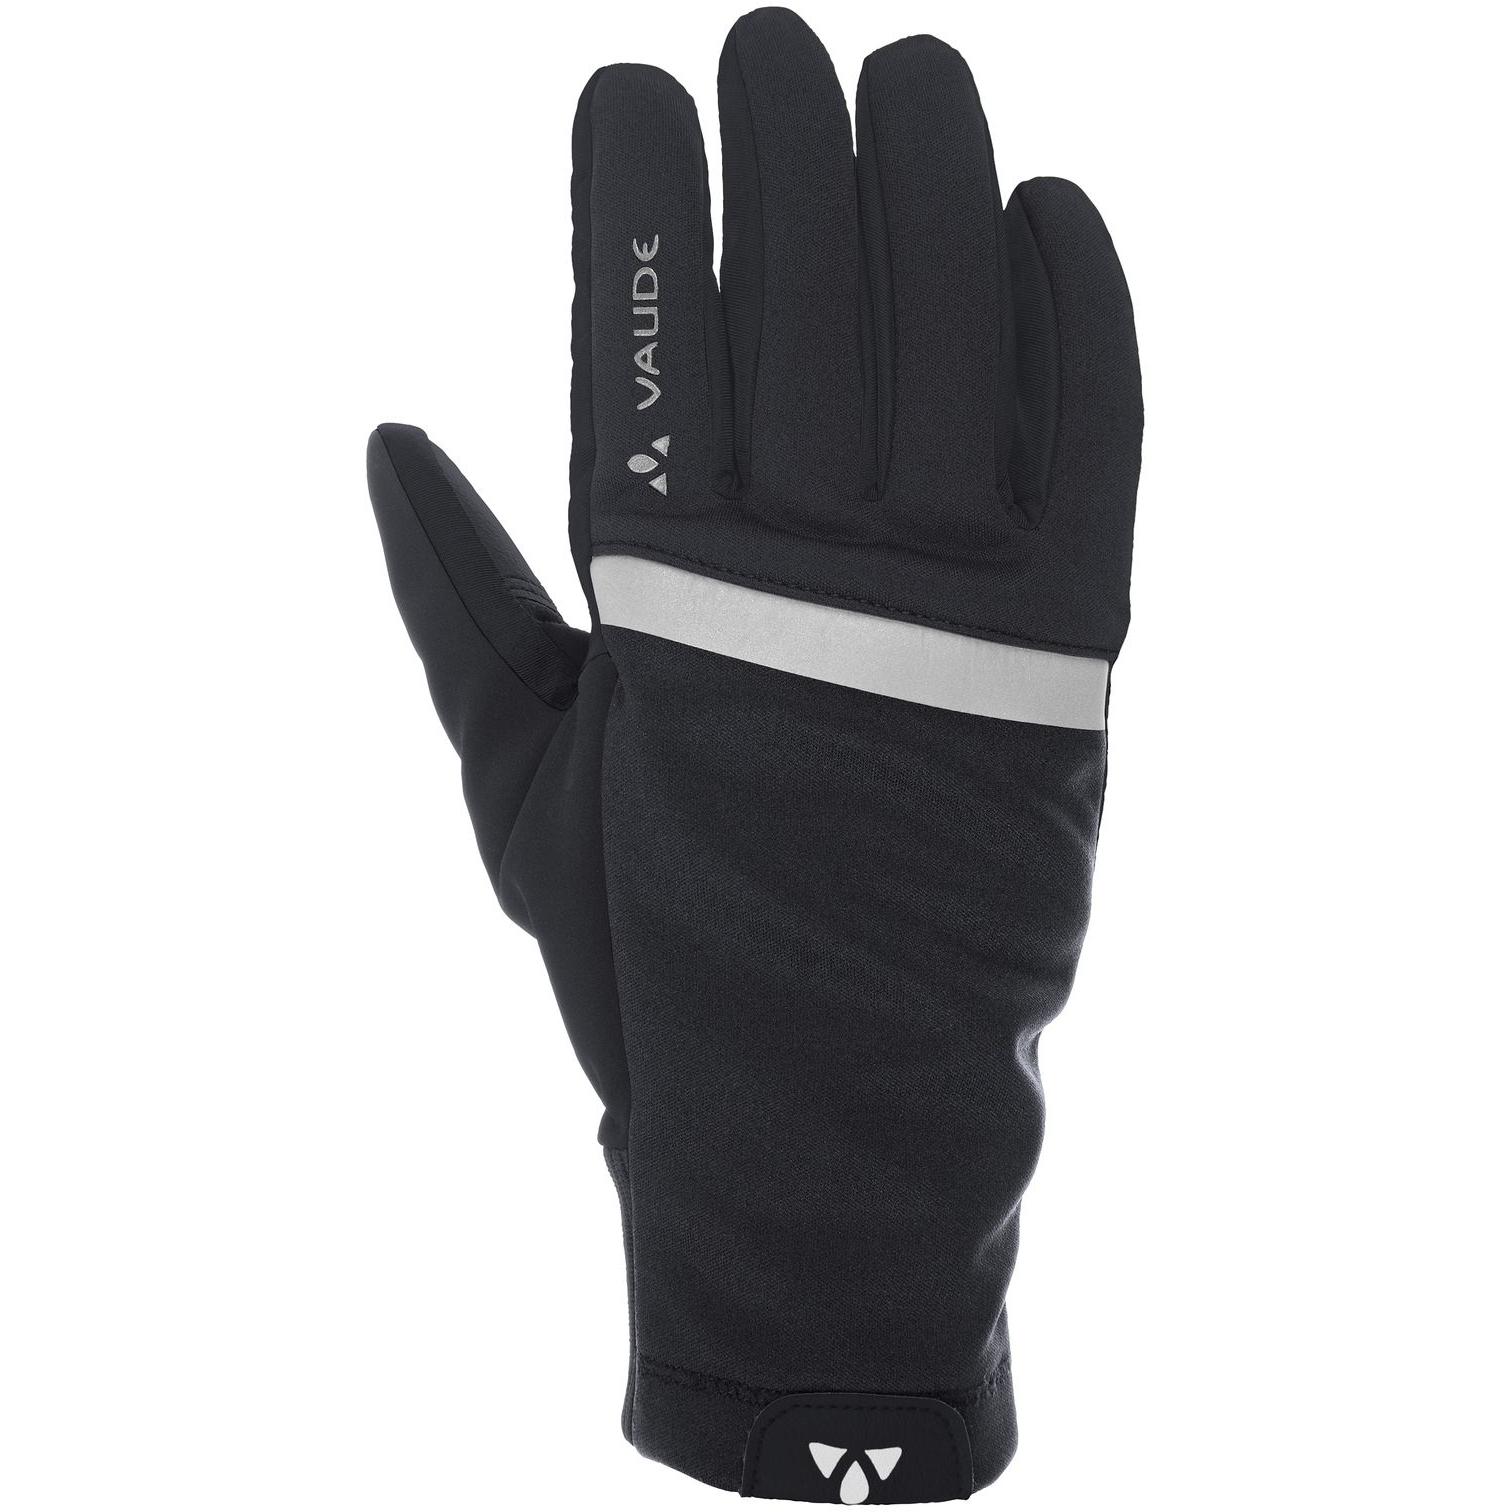 Image of Vaude Hanko Gloves II - black uni